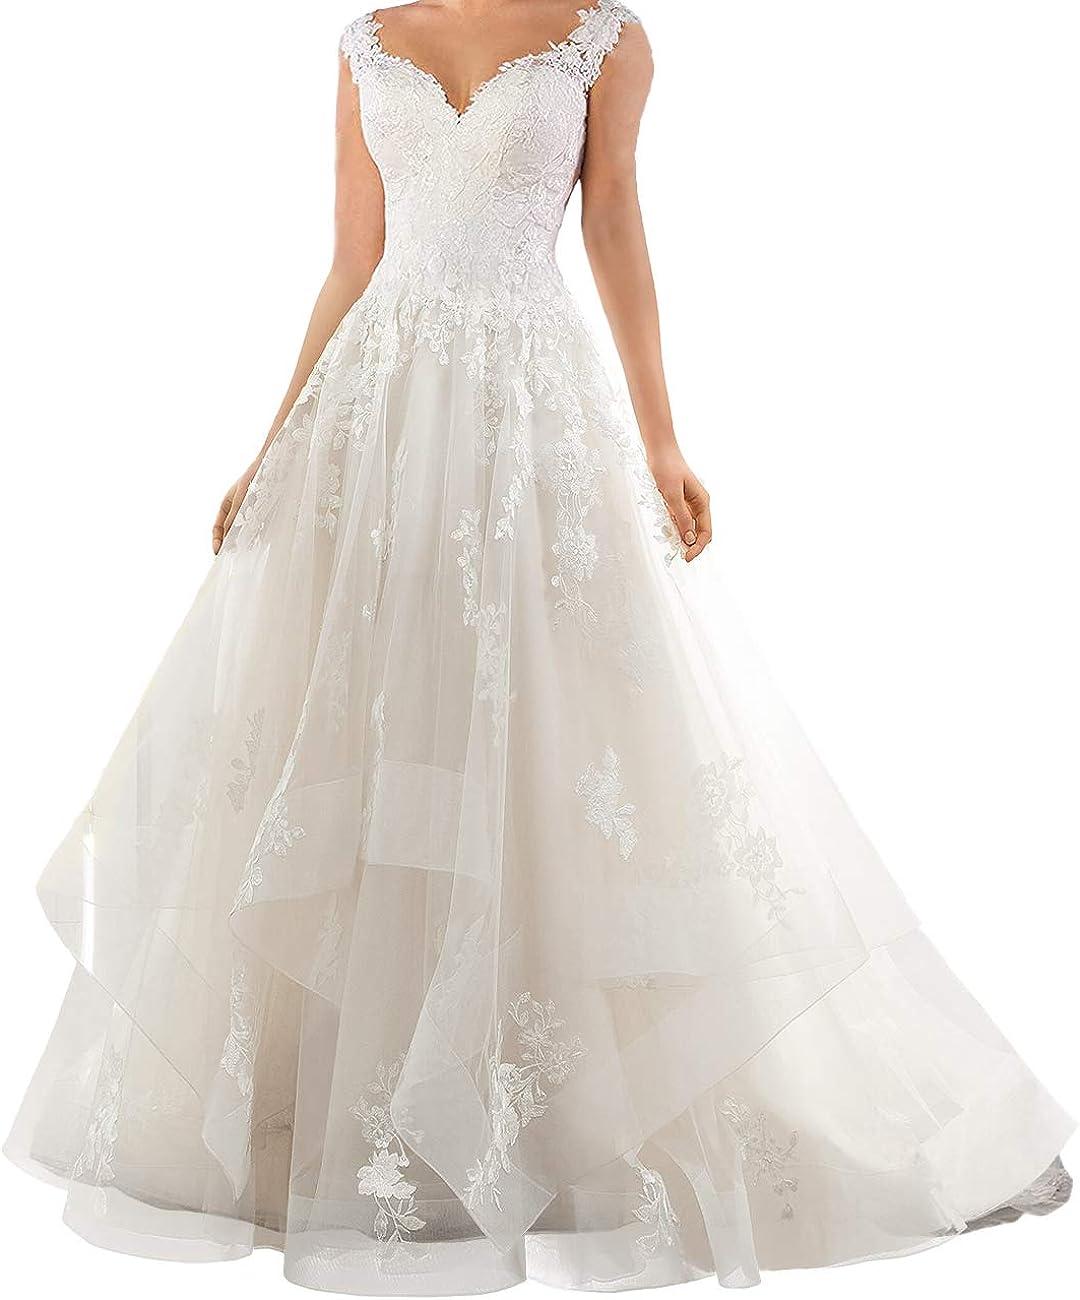 Wedding Dress Lace Bride Dress A Line Wedding Gowns Ruffles Bridal Gowns Sleeveless